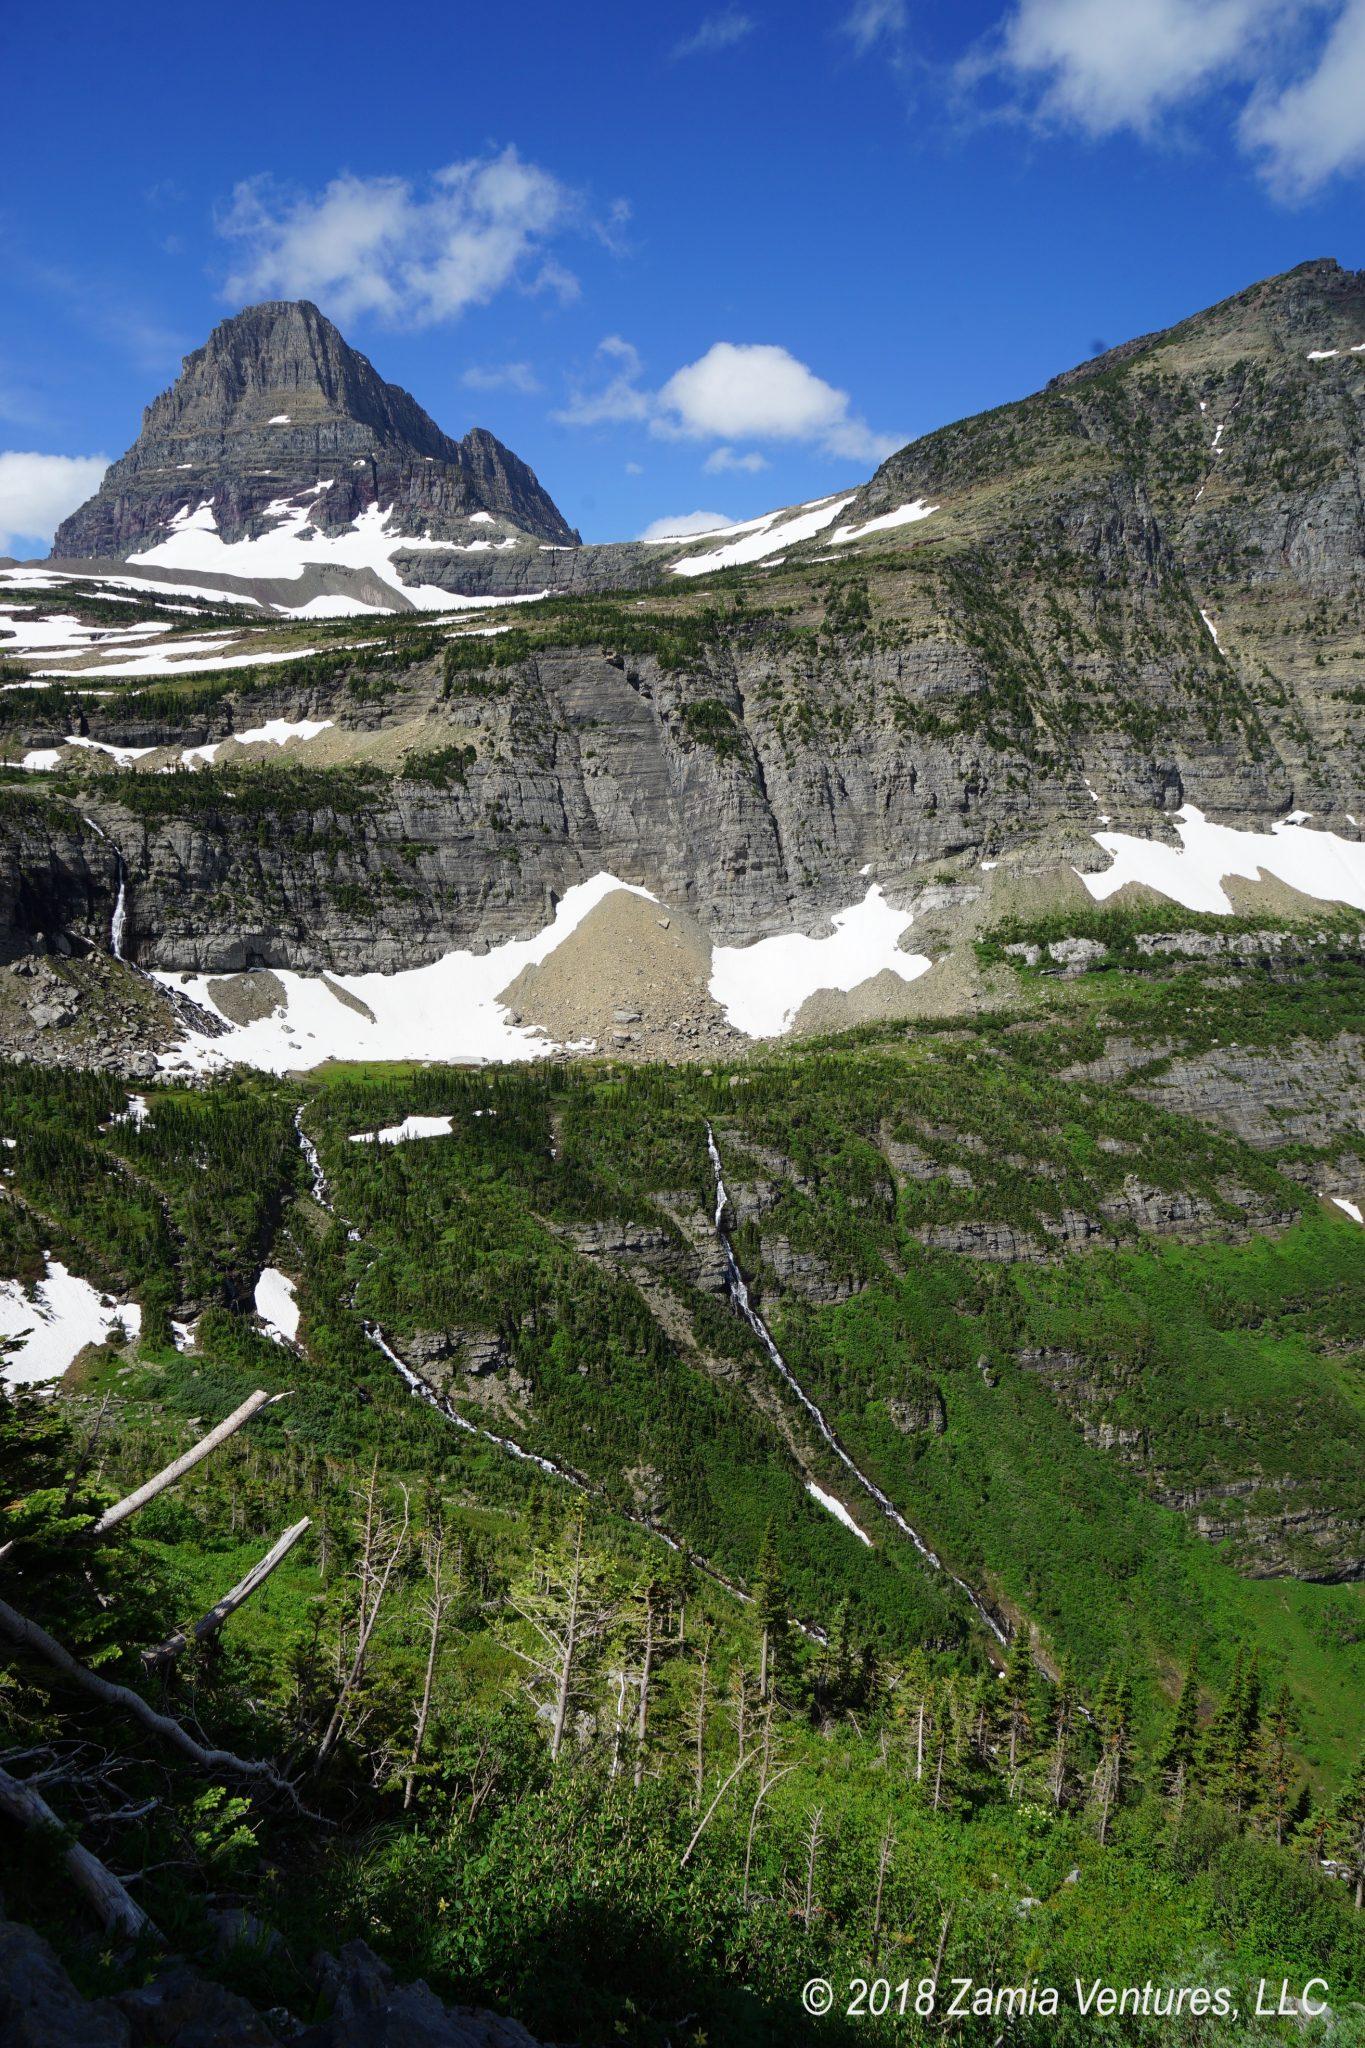 Gaping at Eastern Glacier National Park